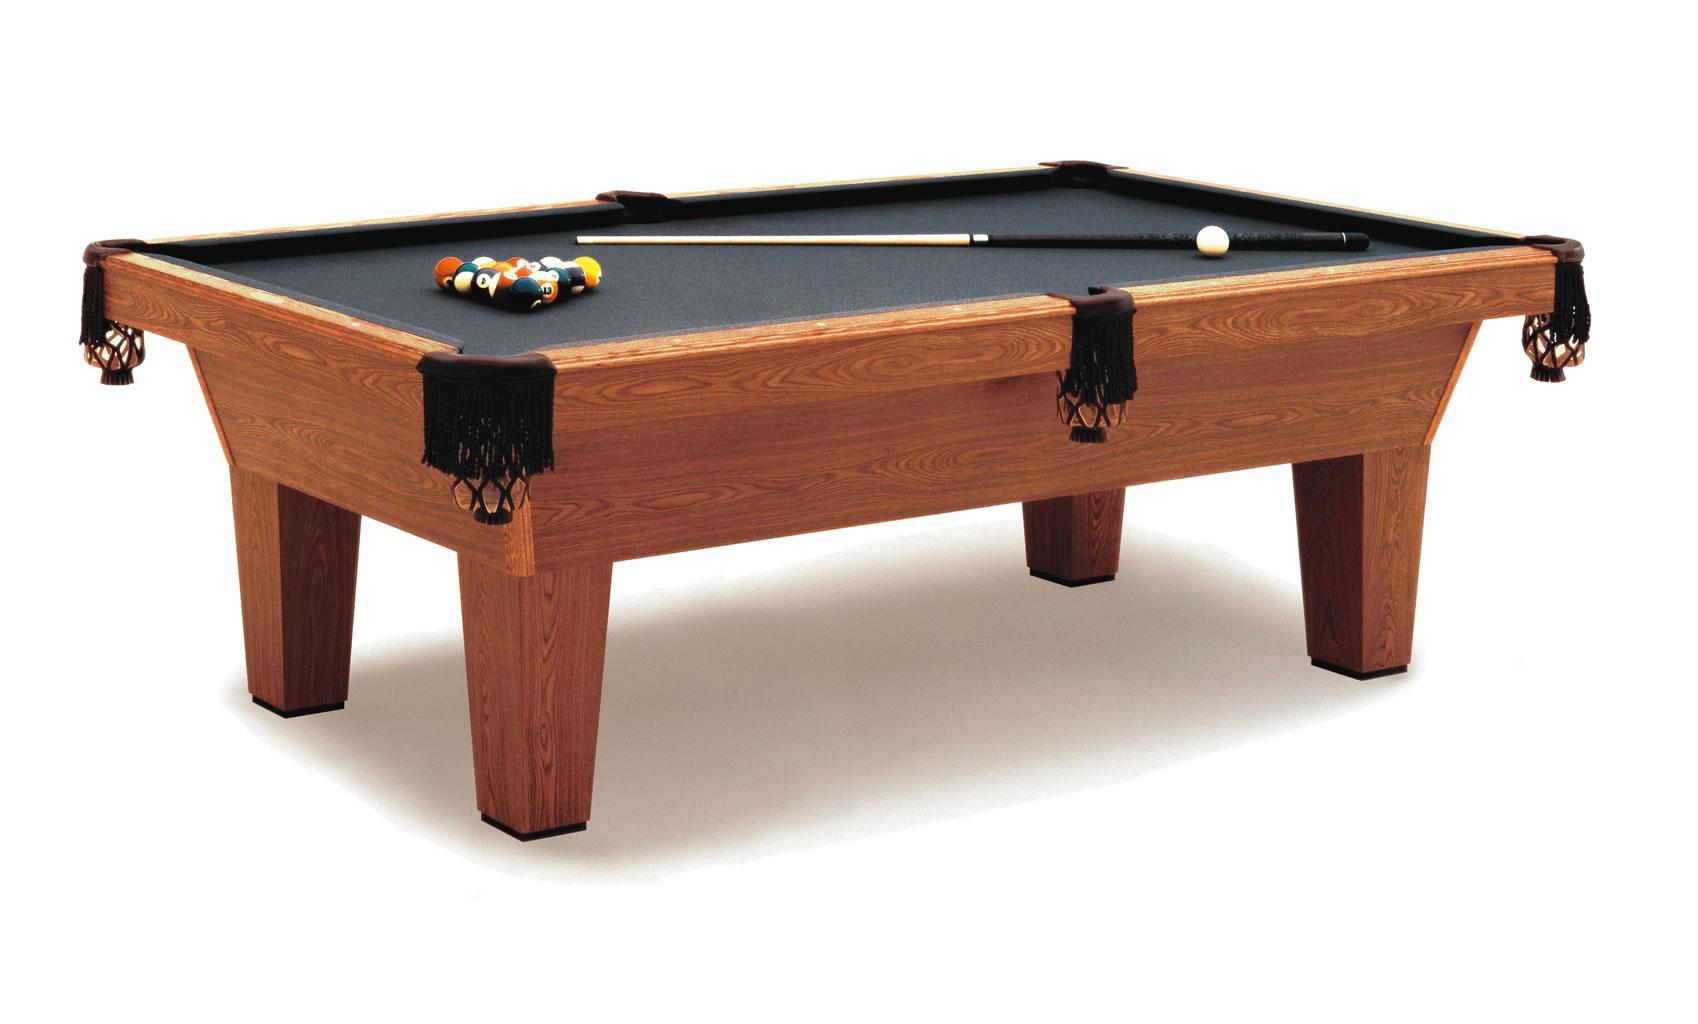 Olhausen Pool Tables Absolute Billiard Services - Ponderosa pool table